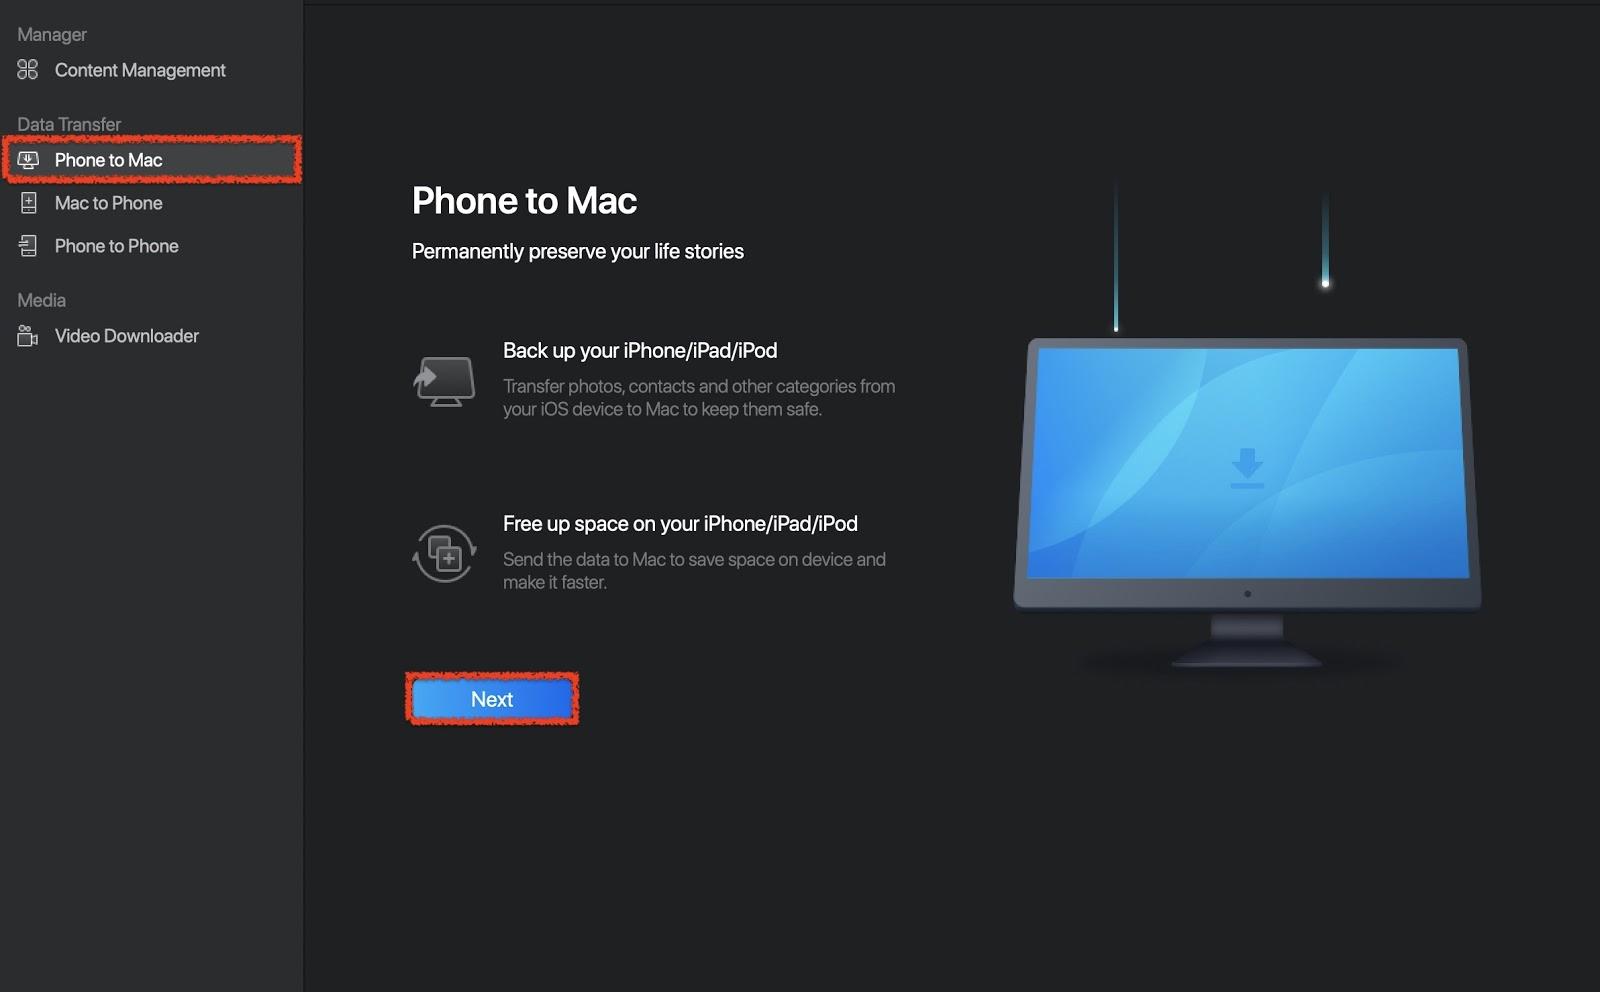 Phone to Mac option